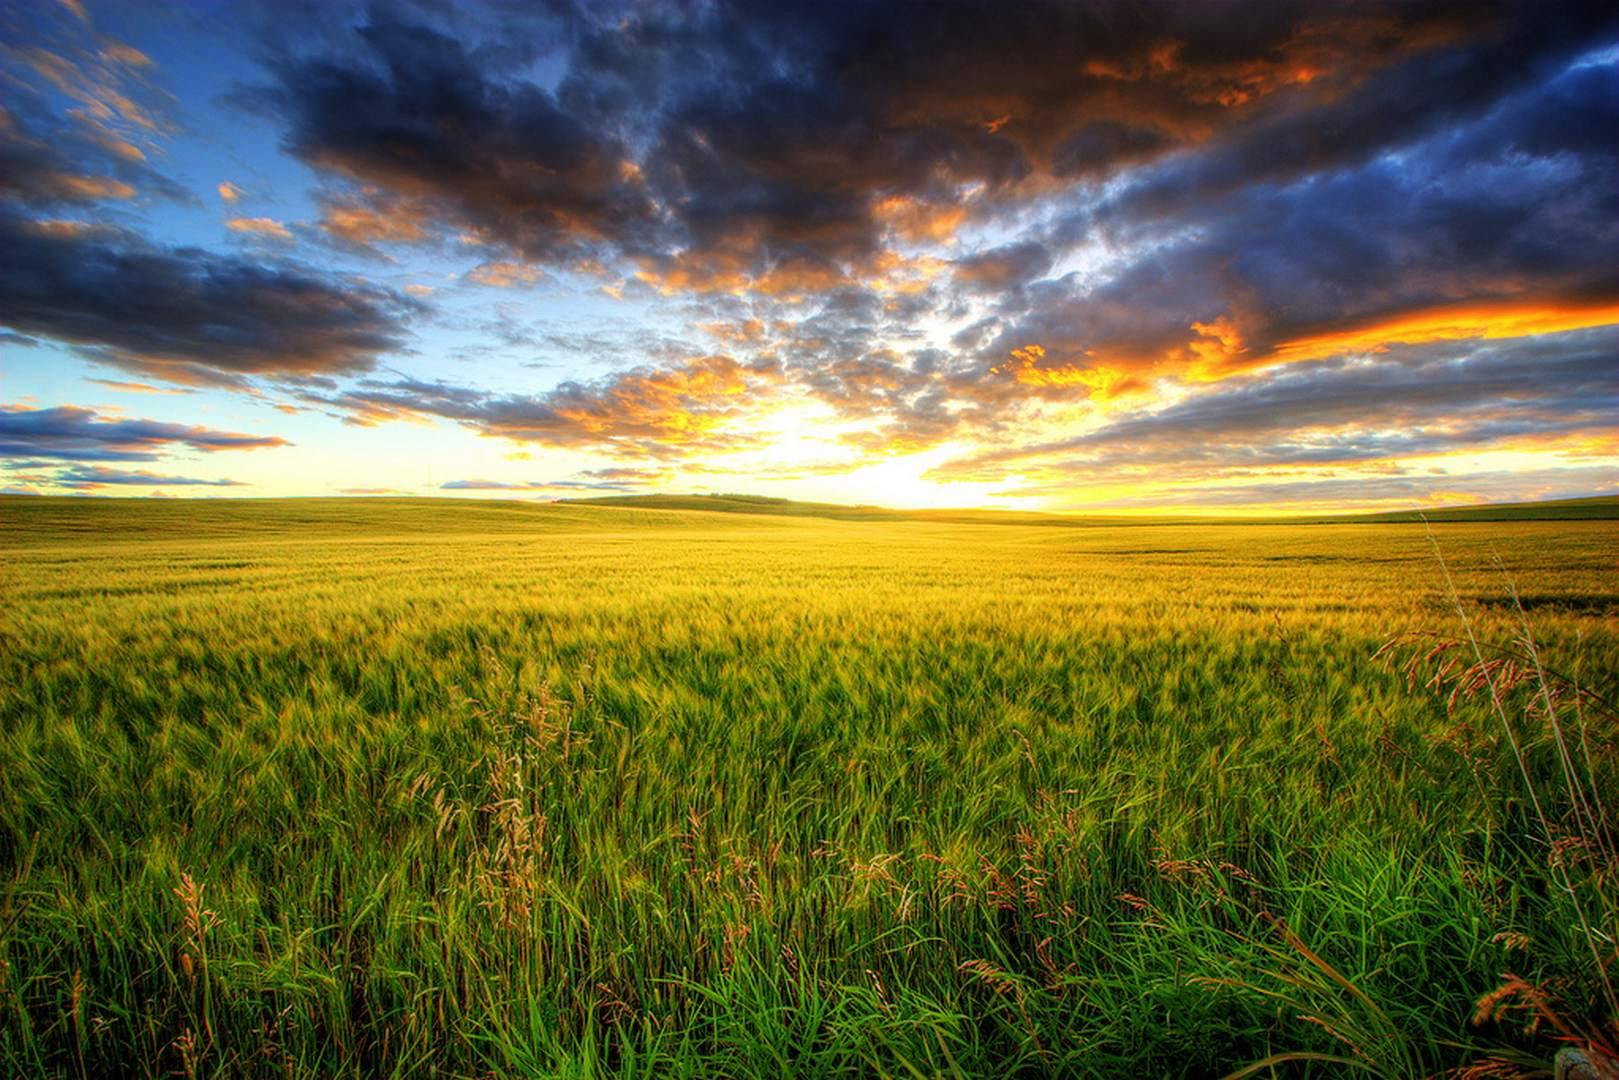 sunset-nature